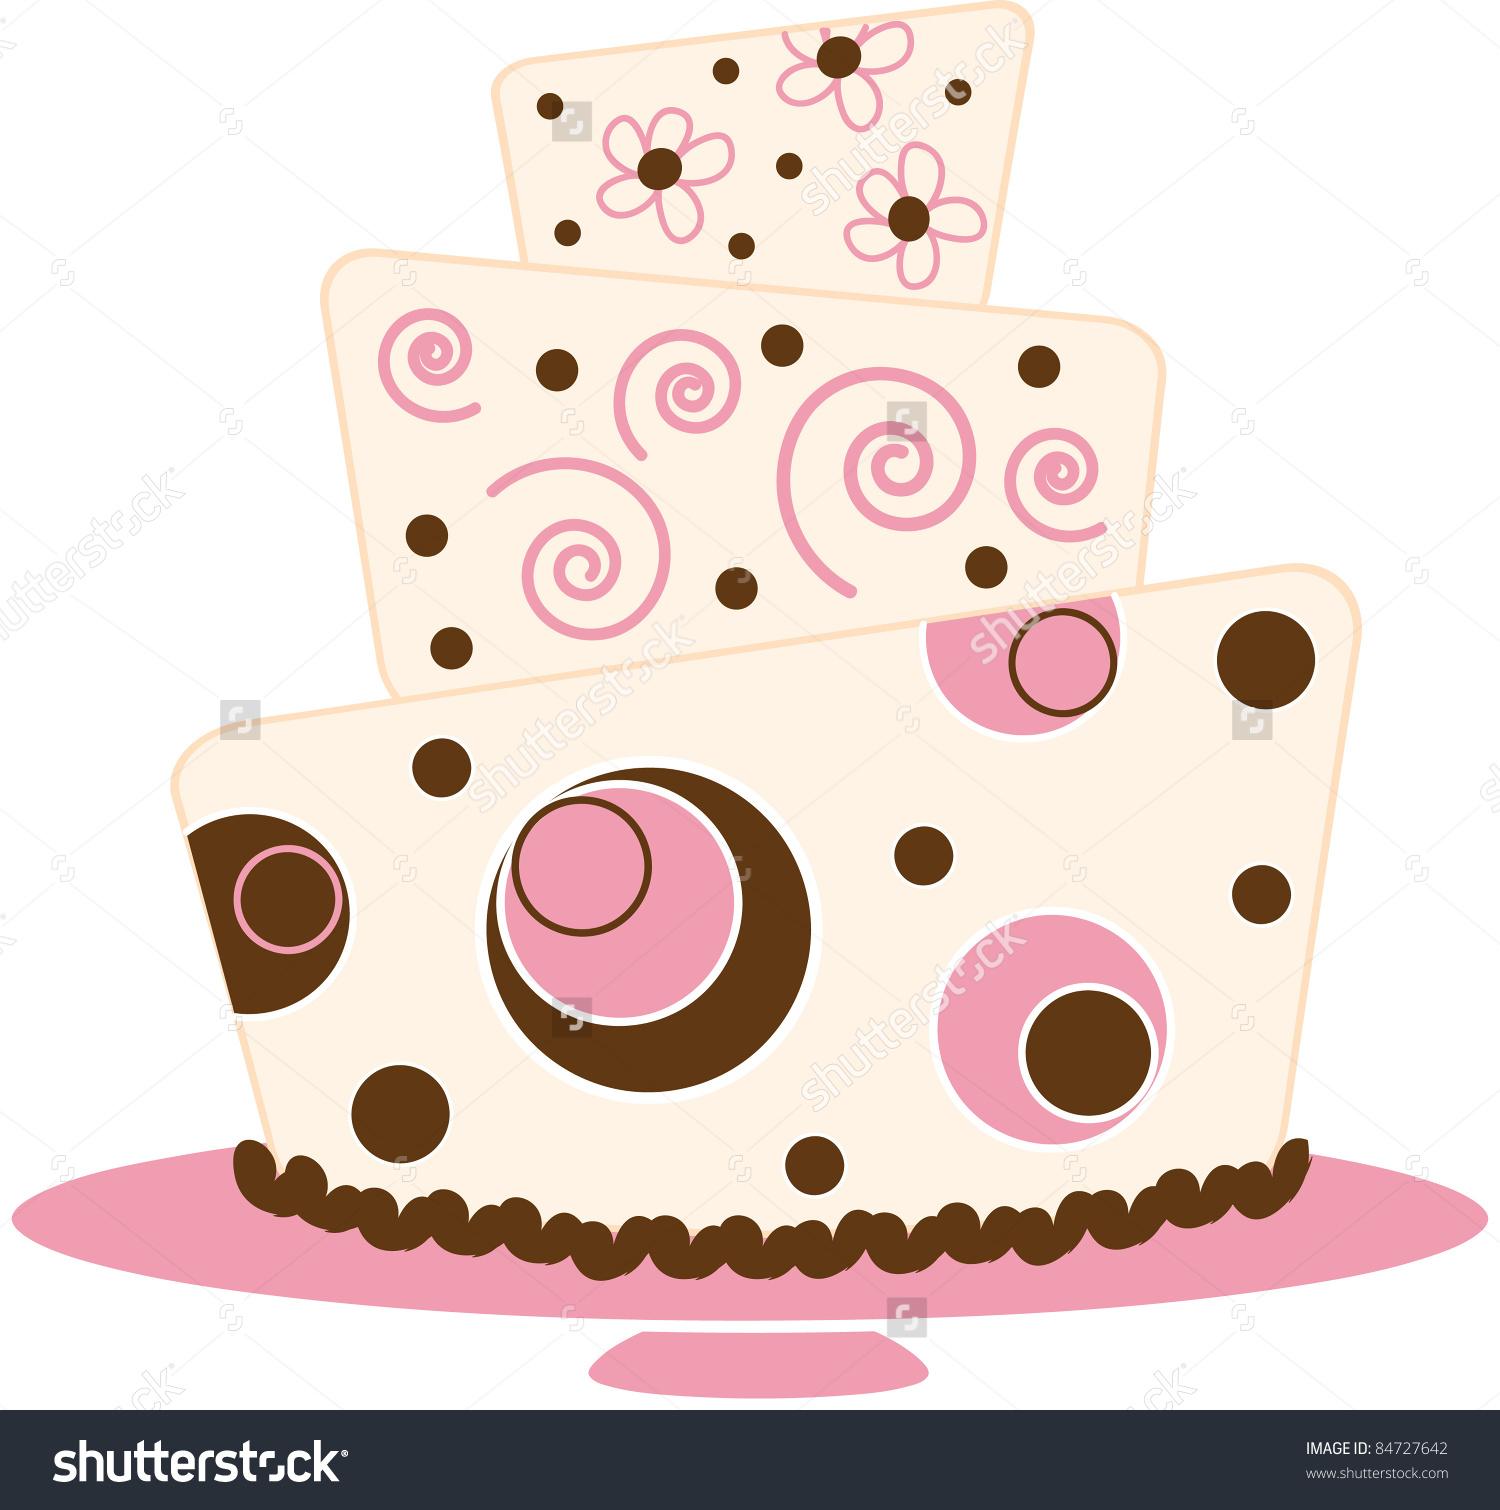 Cake clipart fancy cake Stock Art Layer Illustration clipart